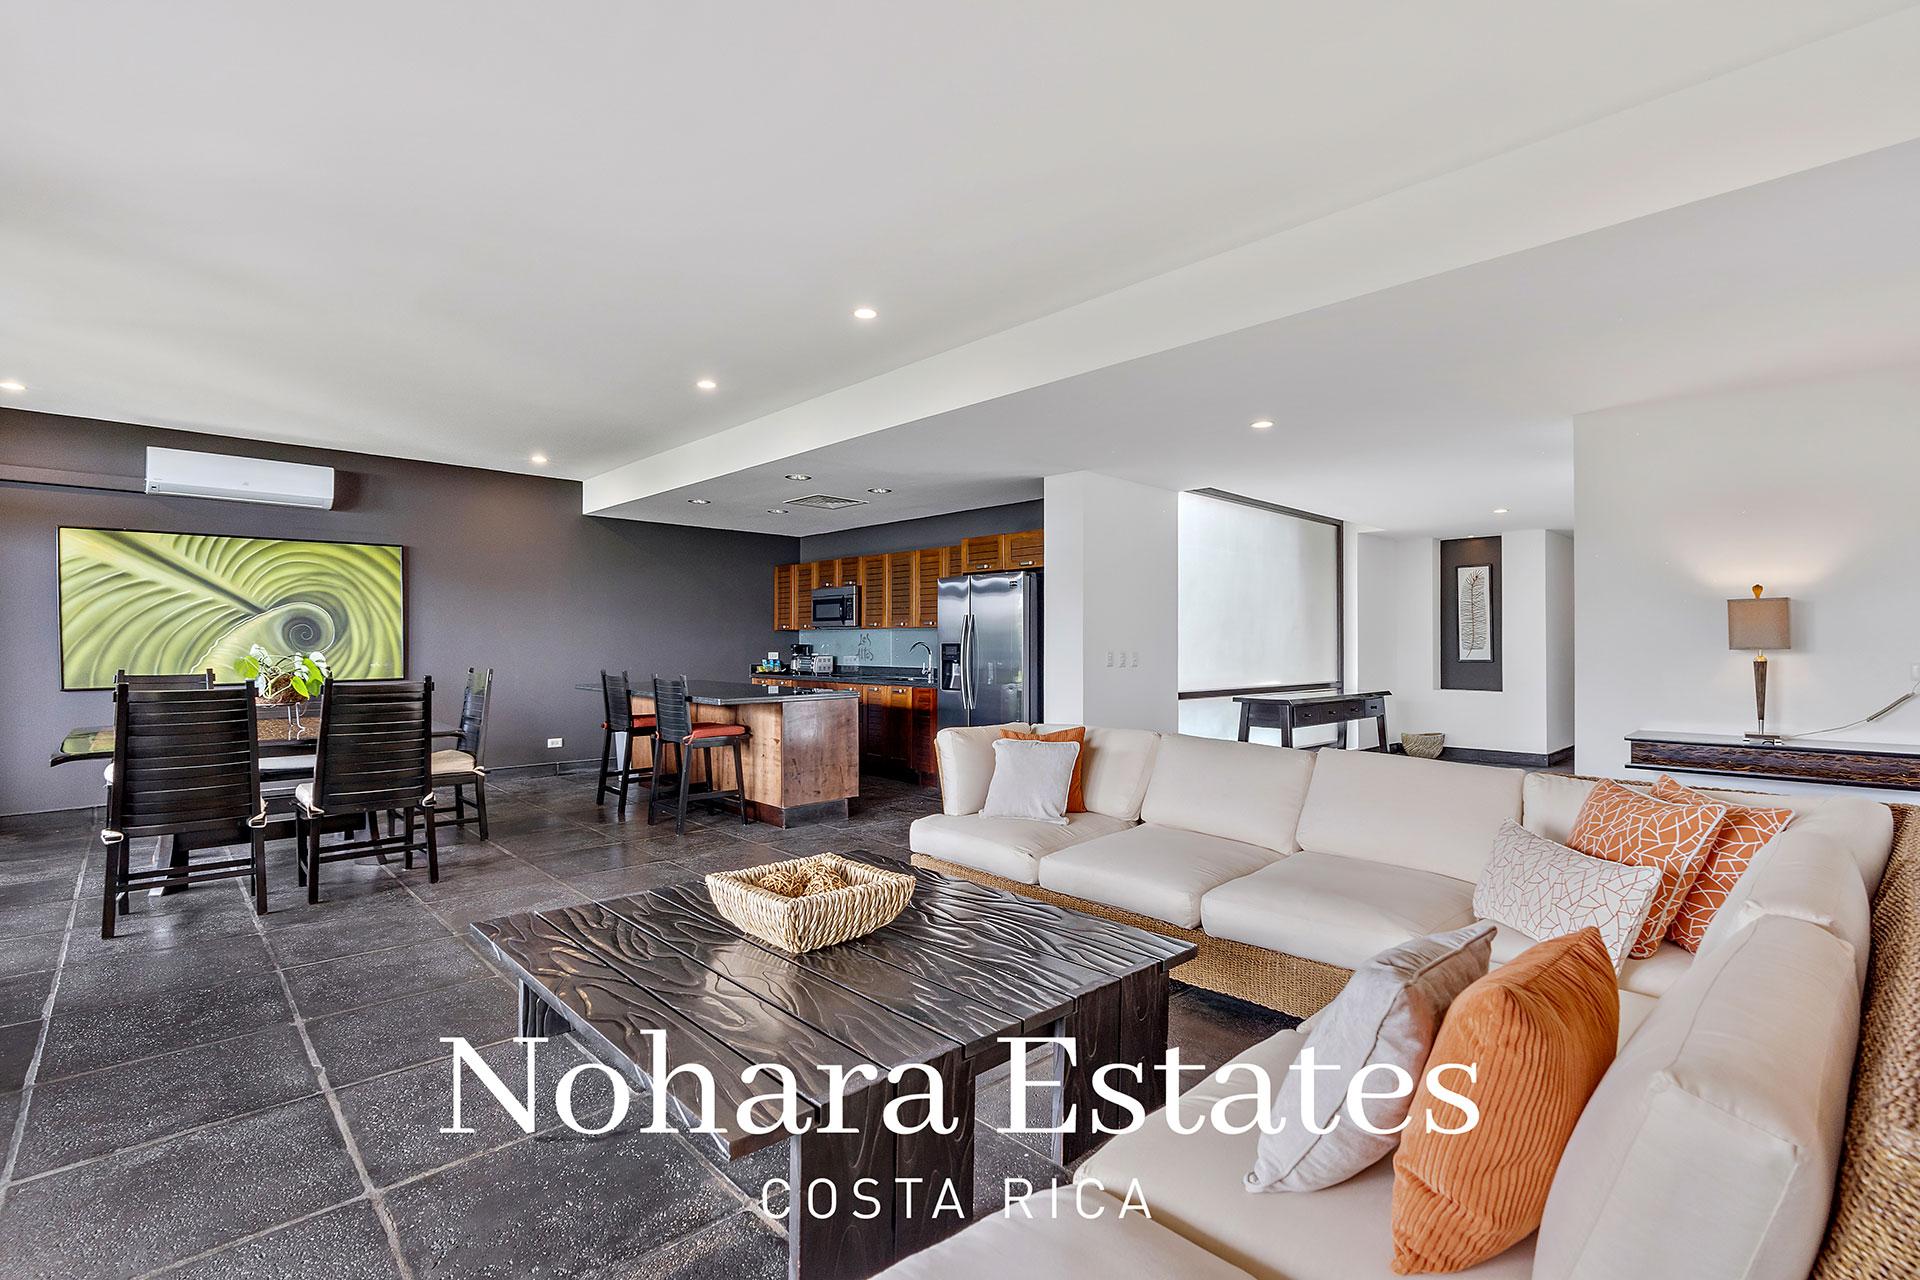 Nohara Estates Costa Rica 122 Apartment Quepos Los Altos 2